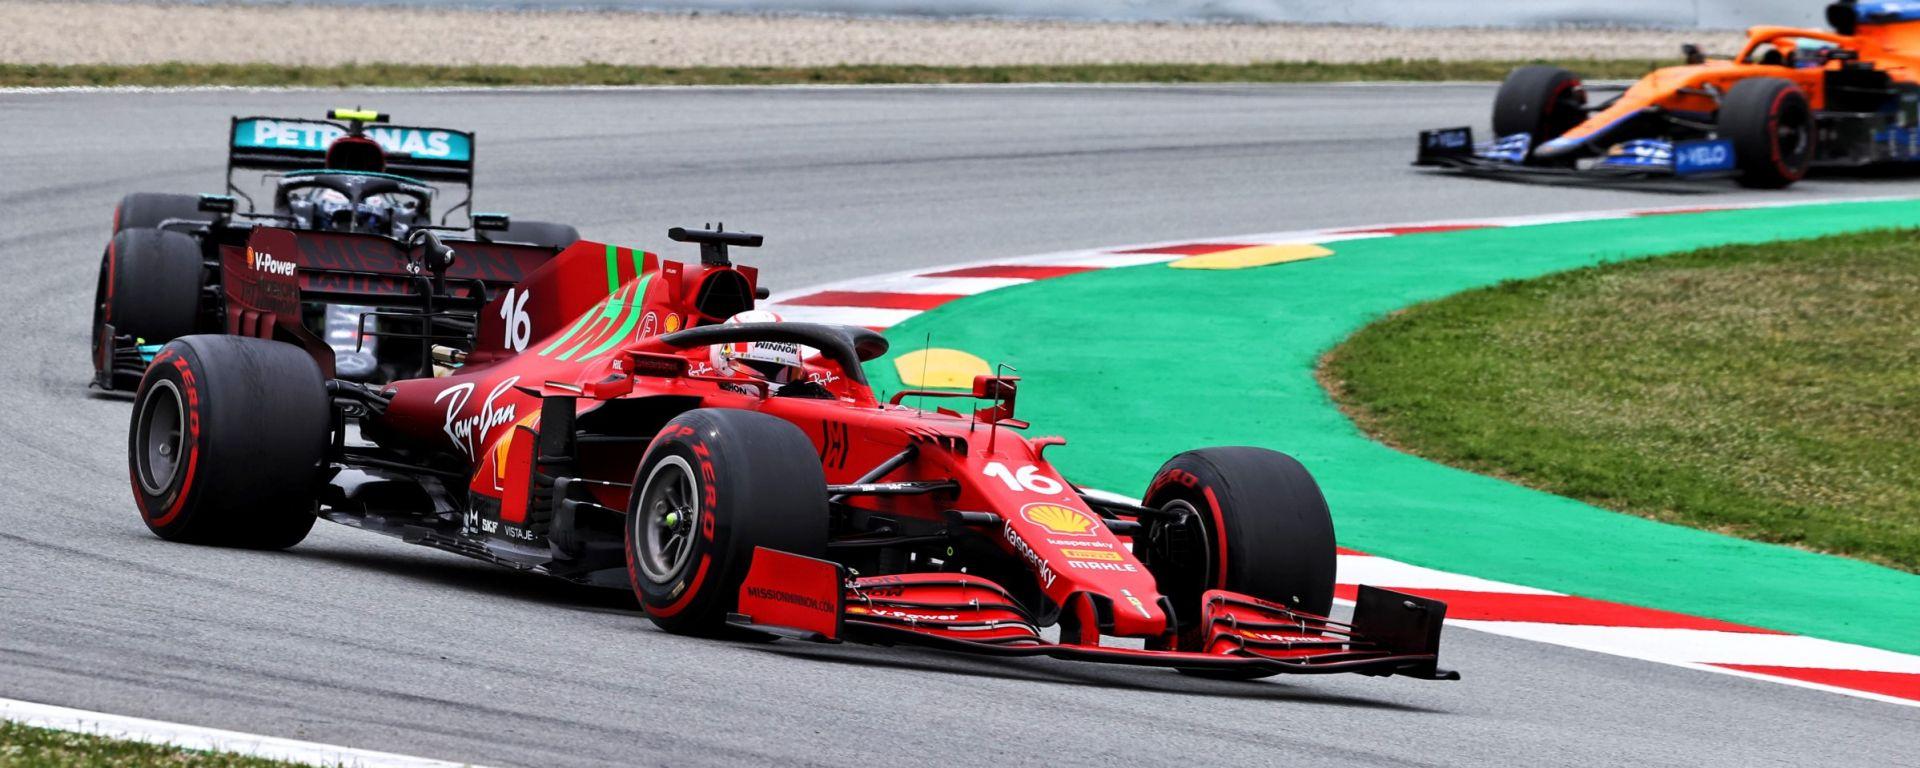 F1, GP Spagna 2021: Charles Leclerc (Ferrari)